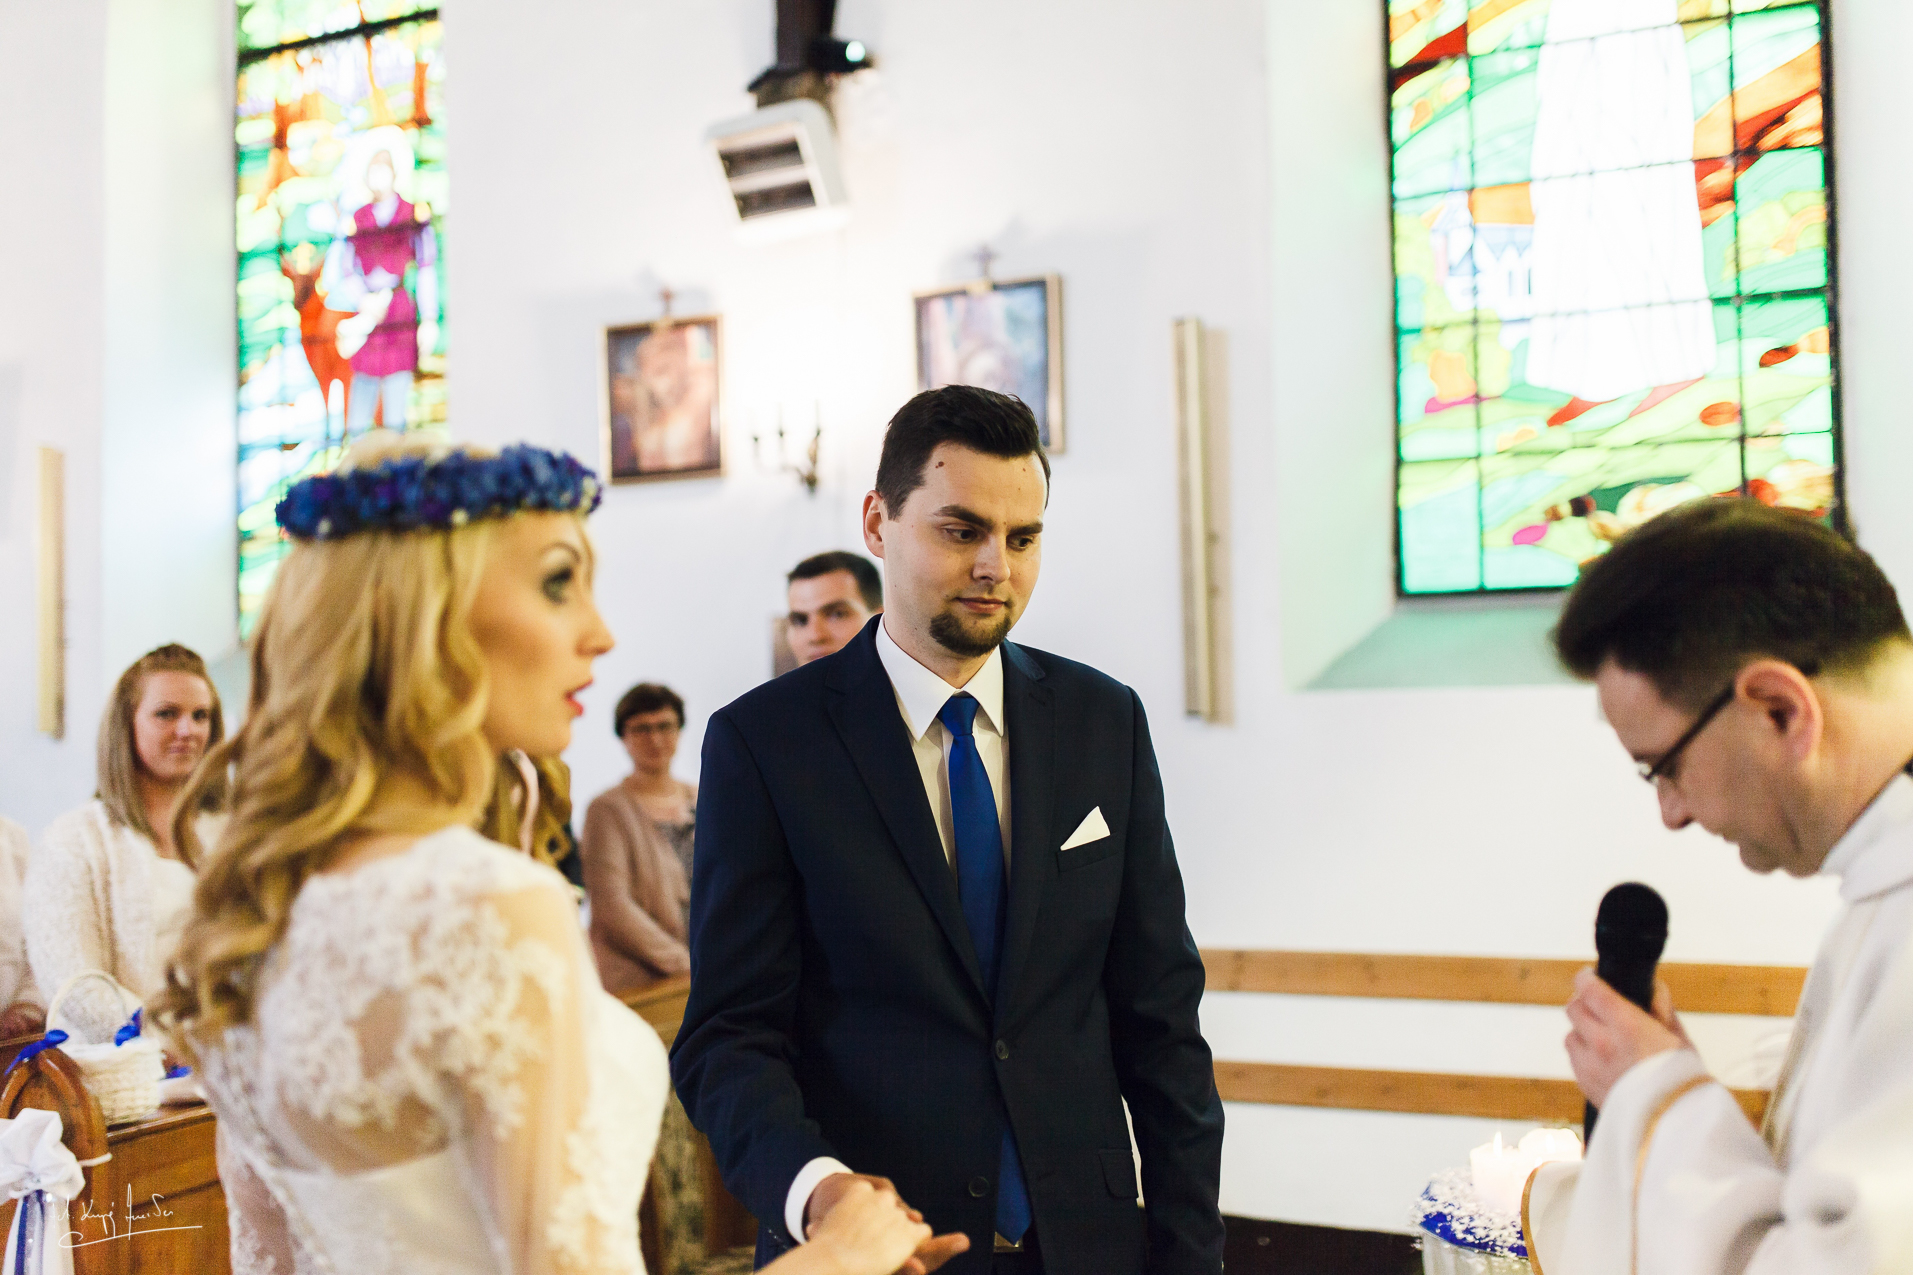 Ślub wesele szklarska poręba 24 Marta & Sławek